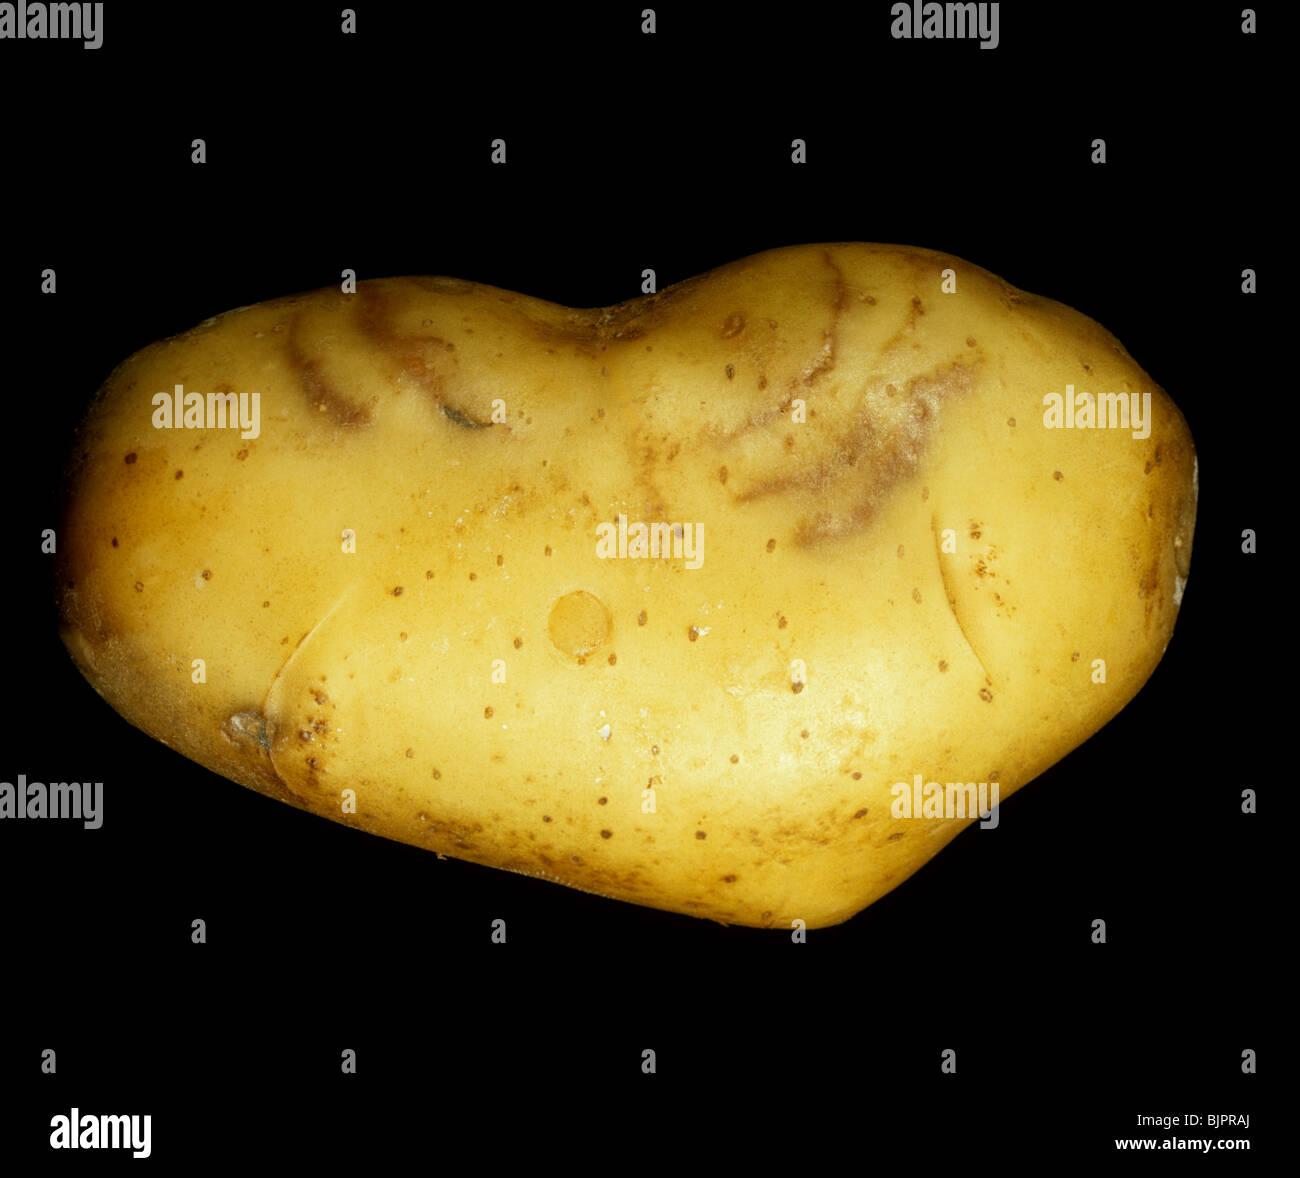 Potato tuber showing external symptoms of spraing caused by potato rattle virus (PRV) - Stock Image